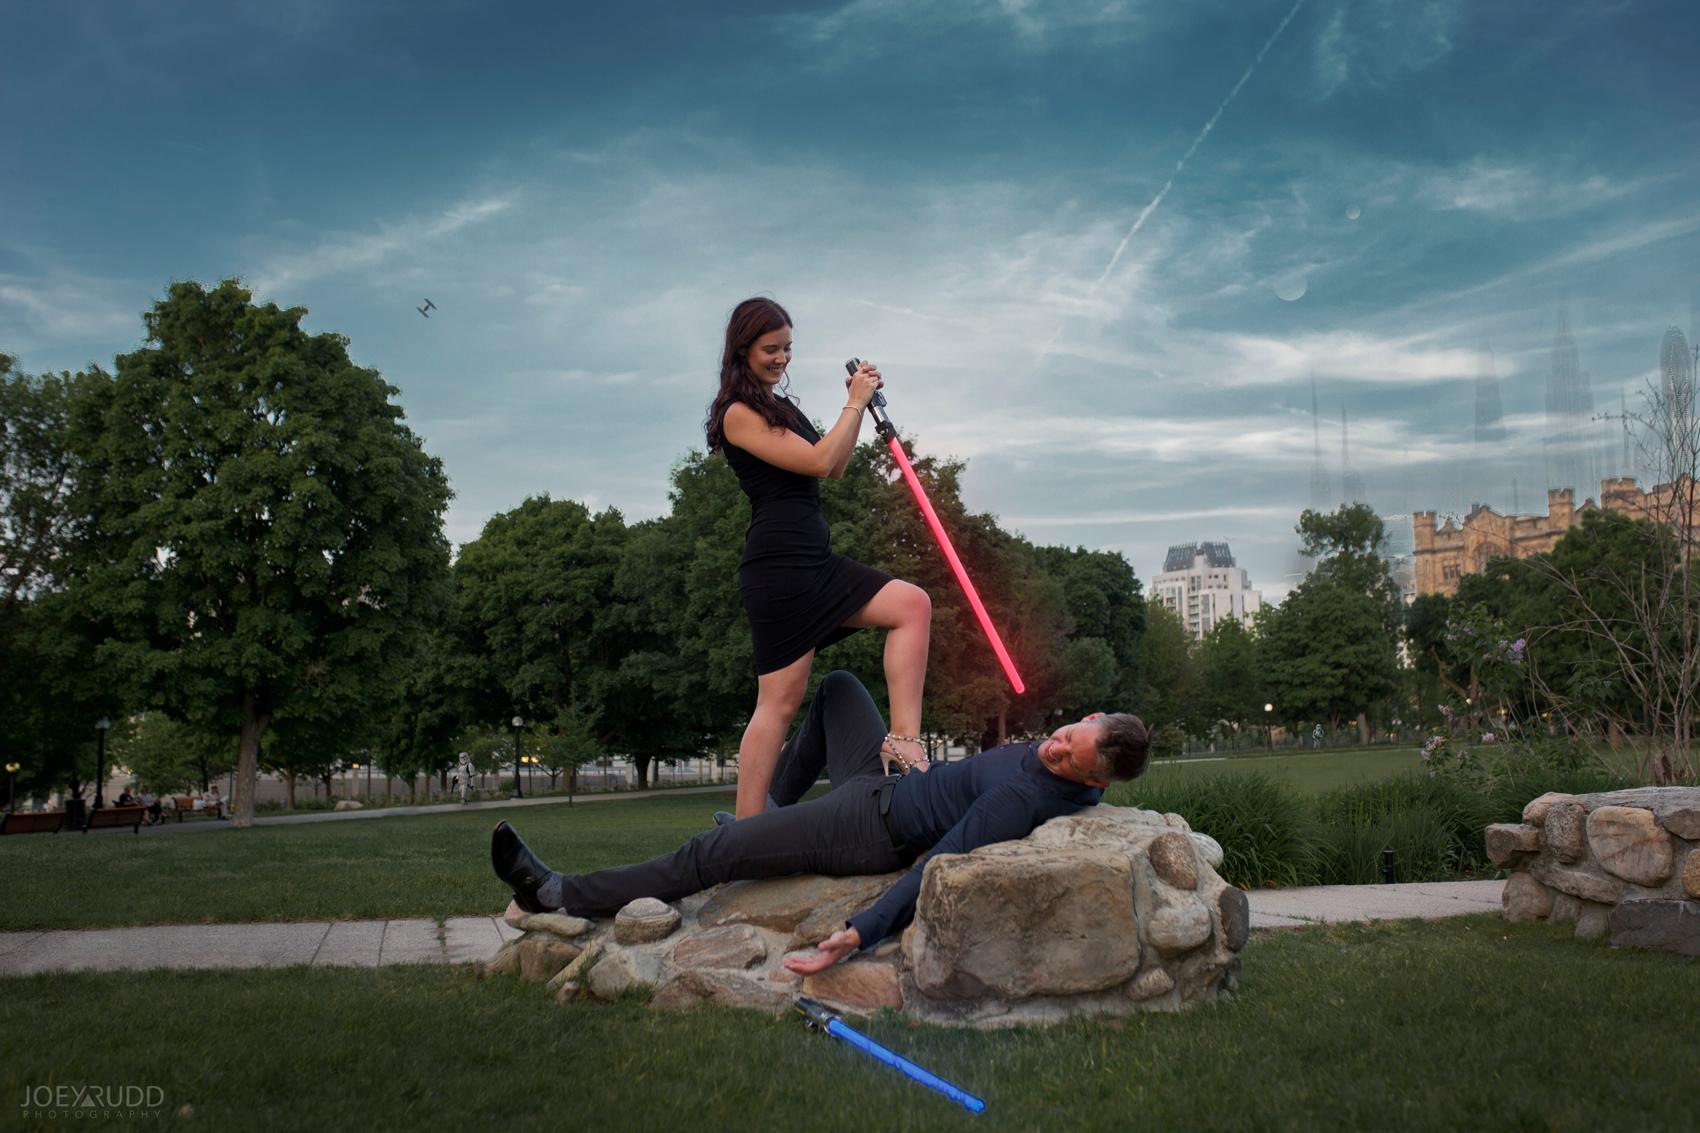 Engagement Photos, Ottawa Photographer, Ottawa Wedding, Ottawa Wedding photographer, downtown ottawa, chateau laurier, light leaks, fun, happy, enaged, photographer, joey rudd photography, lightsabers, star wars, unique, fight